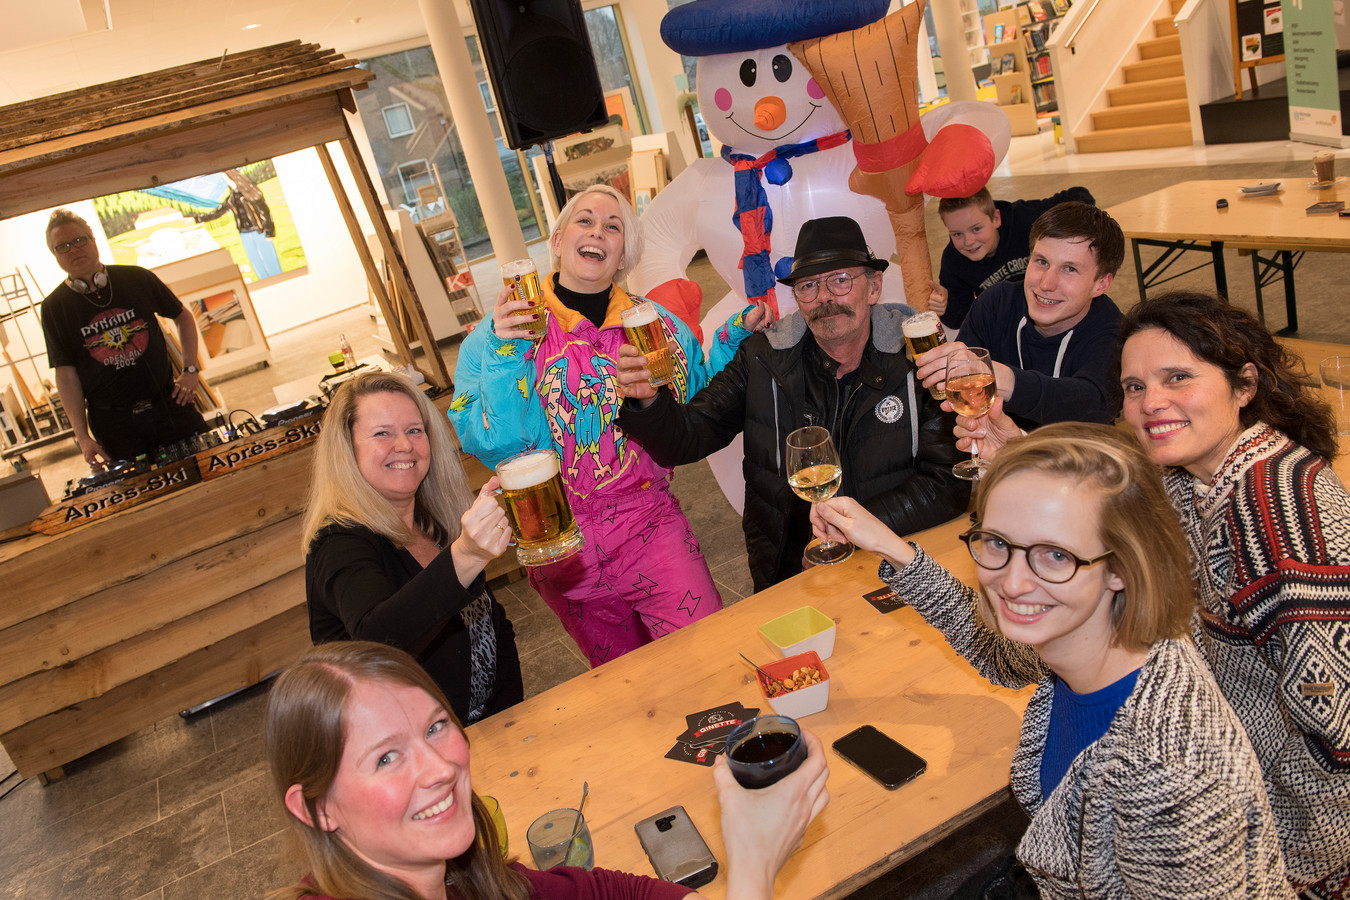 Apres ski party in Zinder.